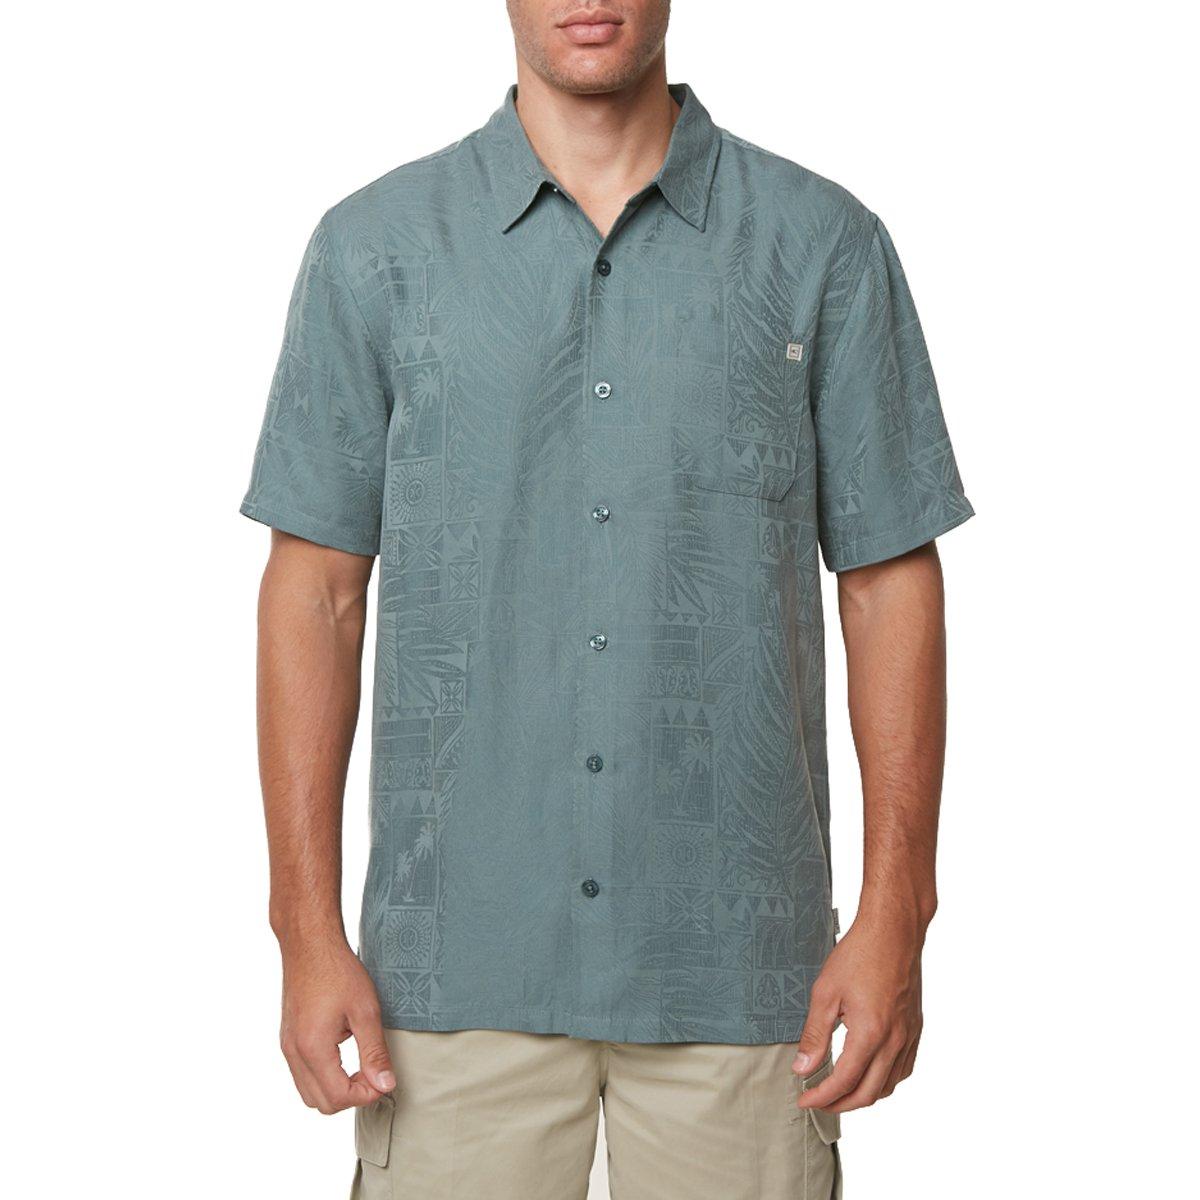 O'Neill Men's Island Life Shirts,Medium,Dark Sea Glass